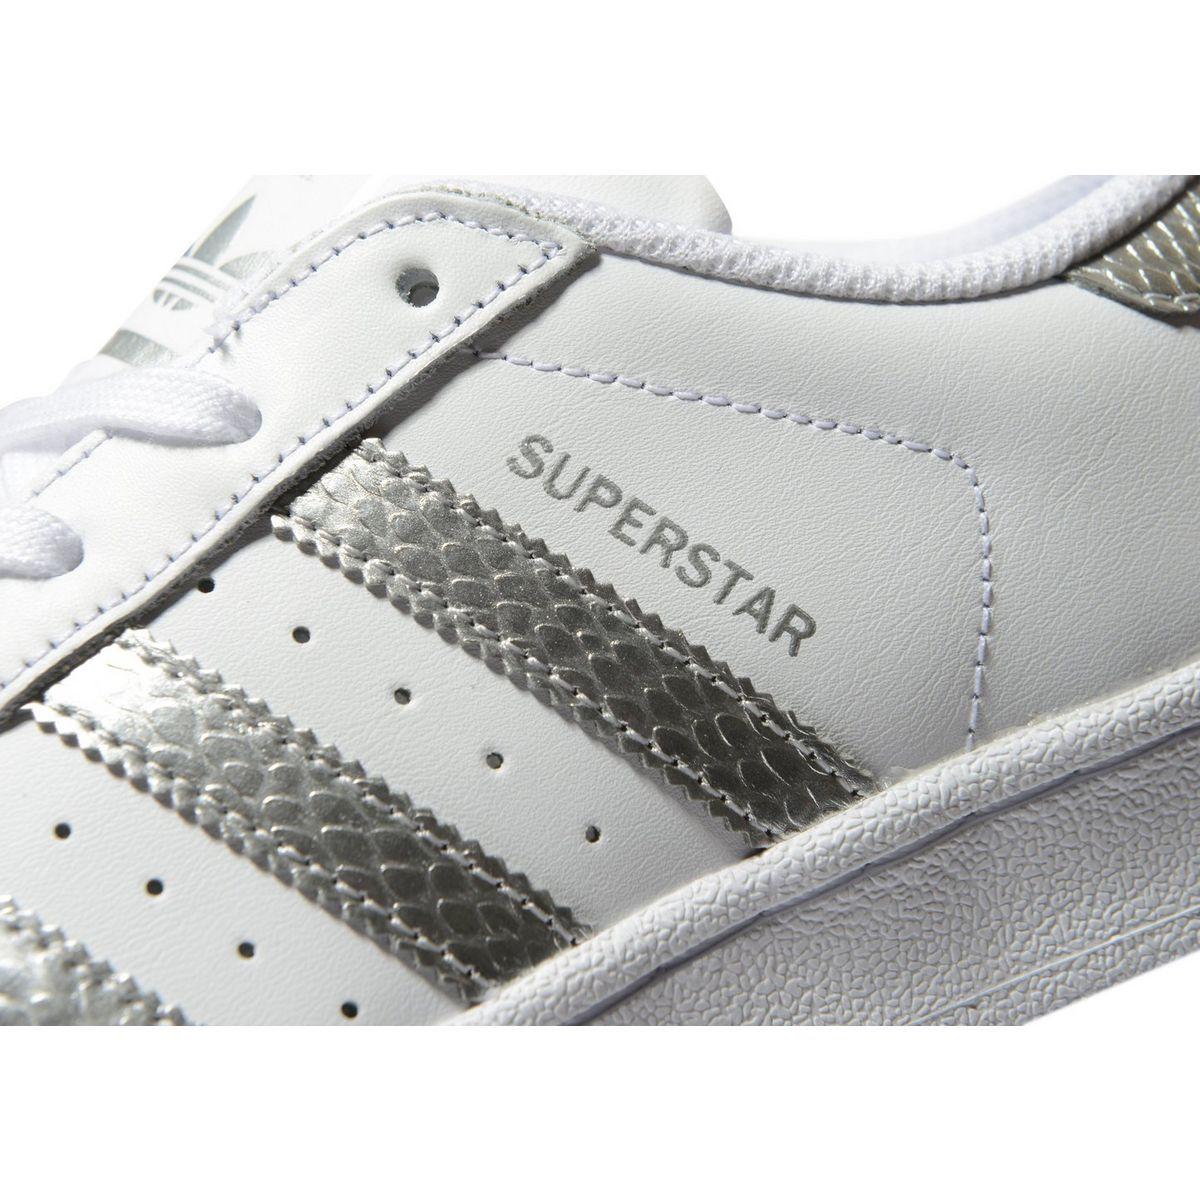 júniorZAPATILLAS Originals adidas Superstar adidas DEPORTE SMpqUzV